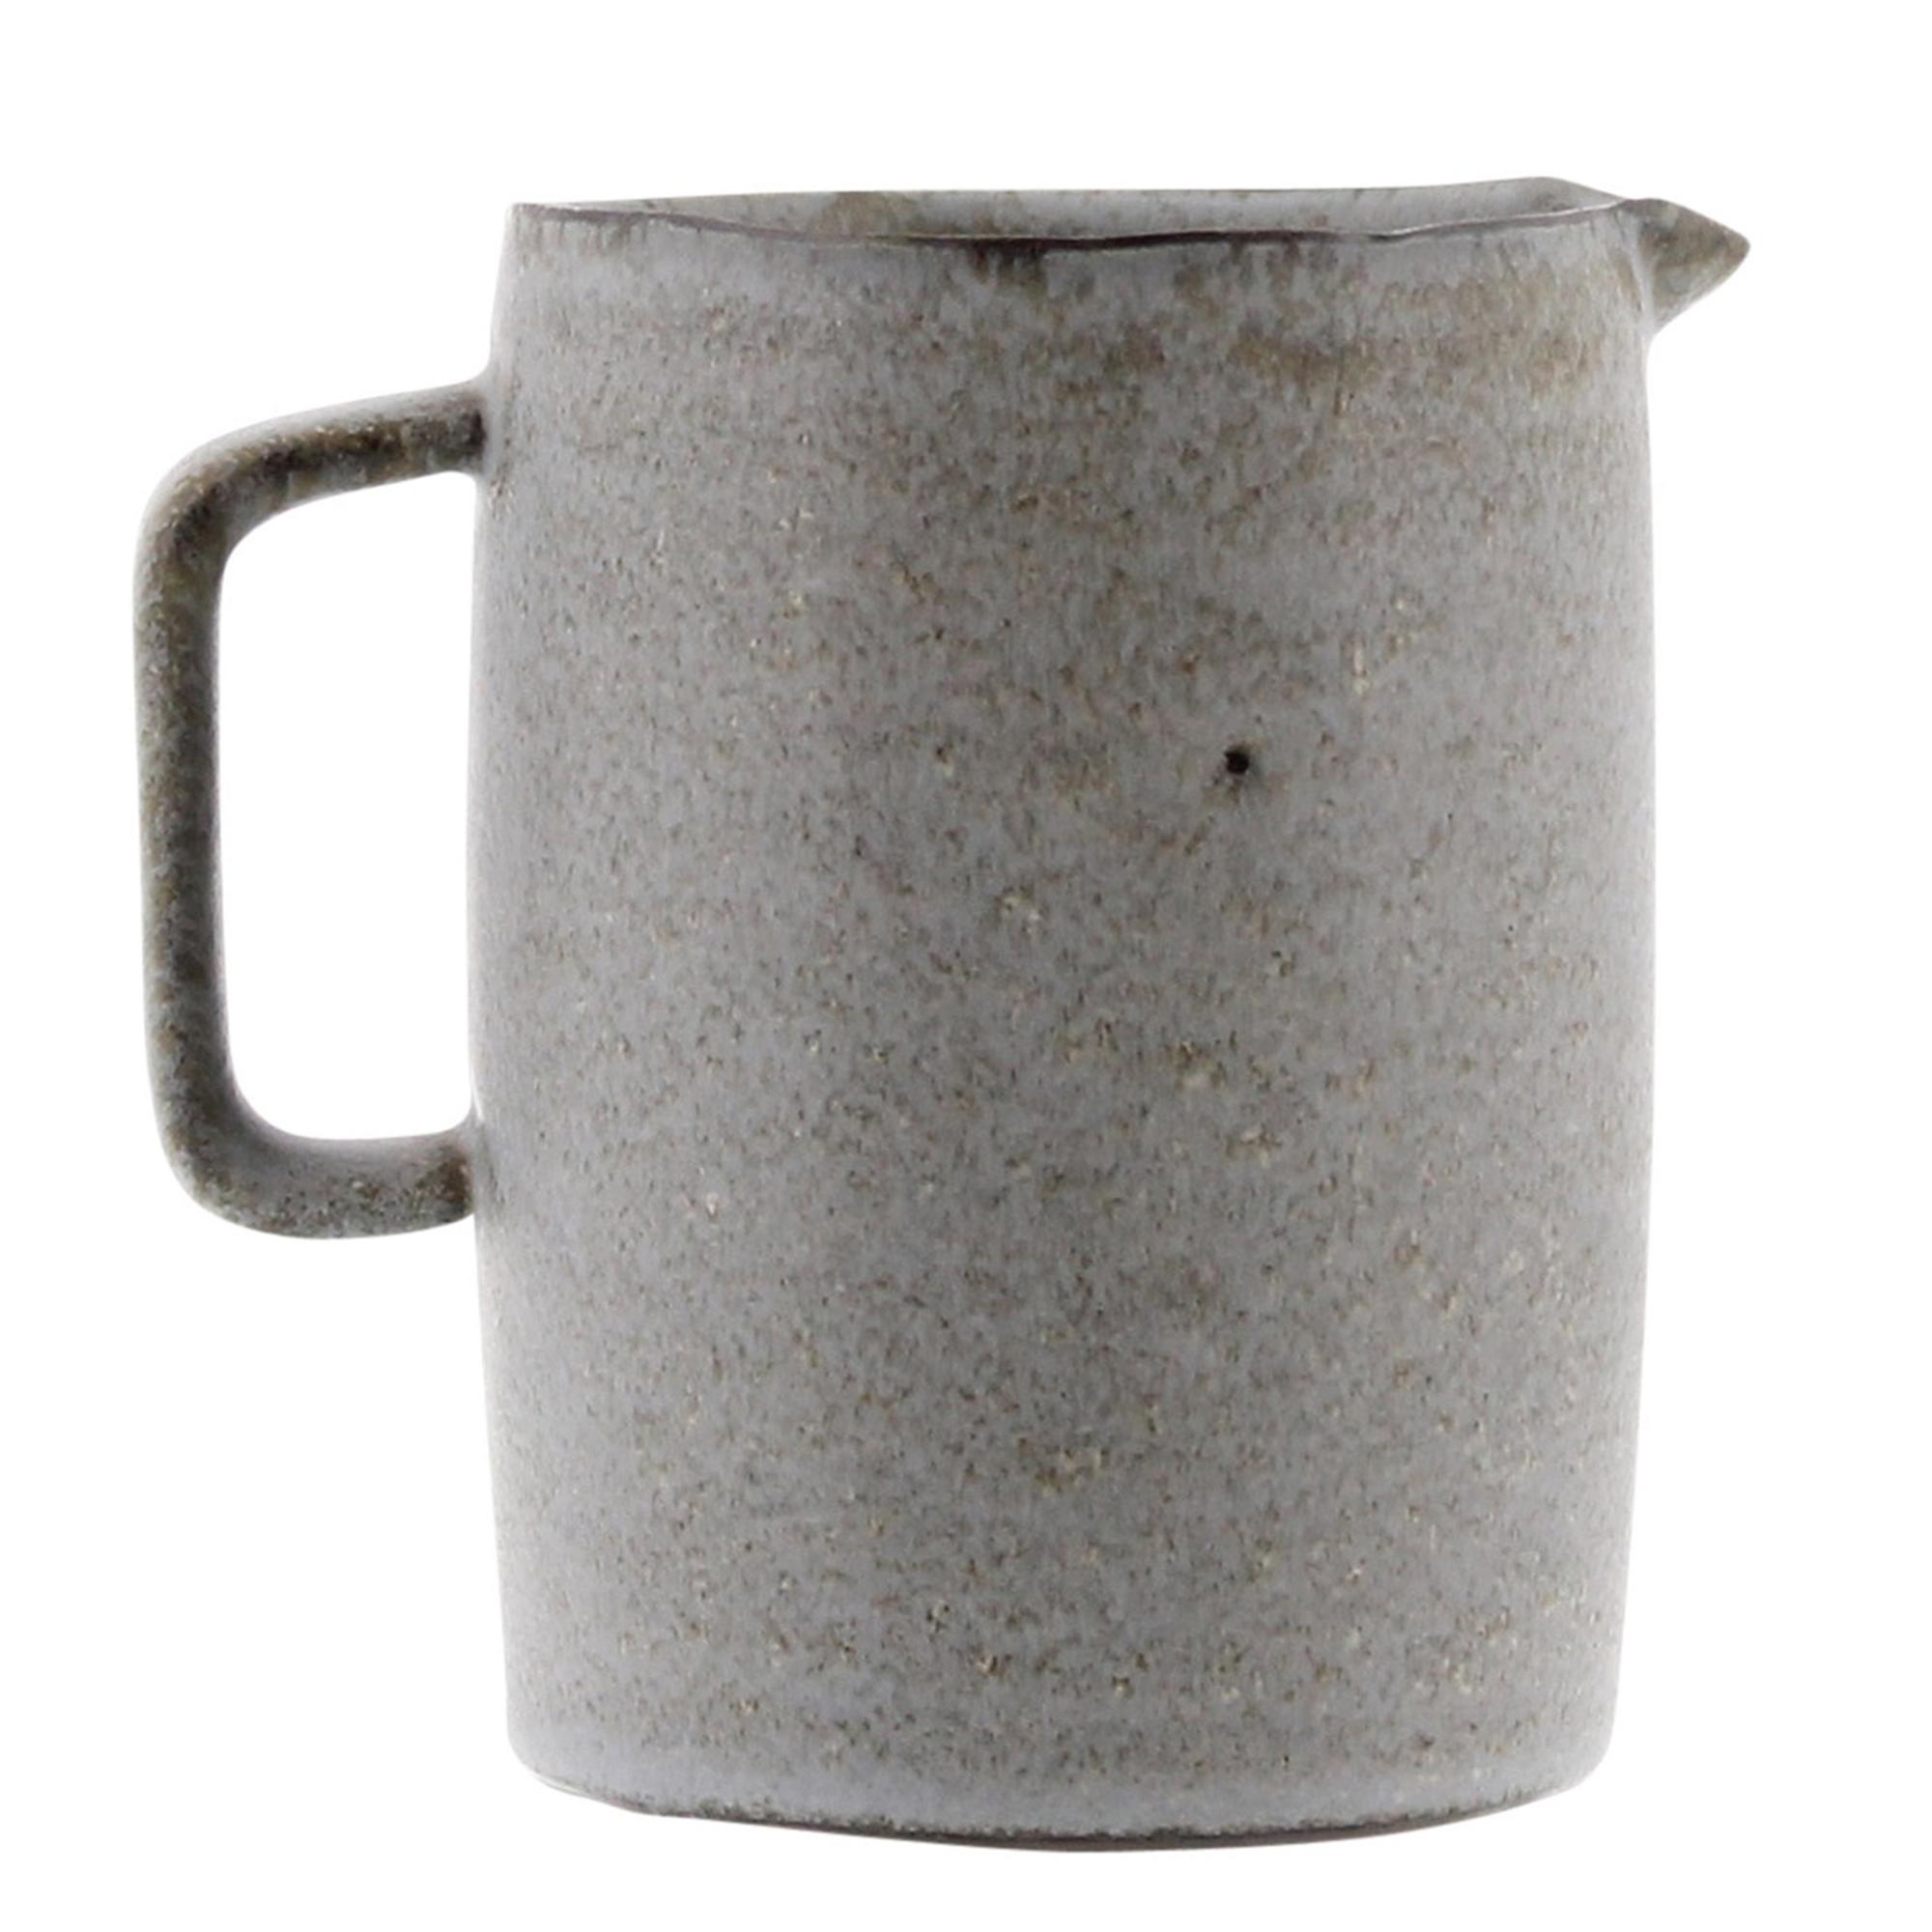 7135-0 - Tiburon Pitcher - Ceramic - Medium - Light Grey Glaze by HomArt